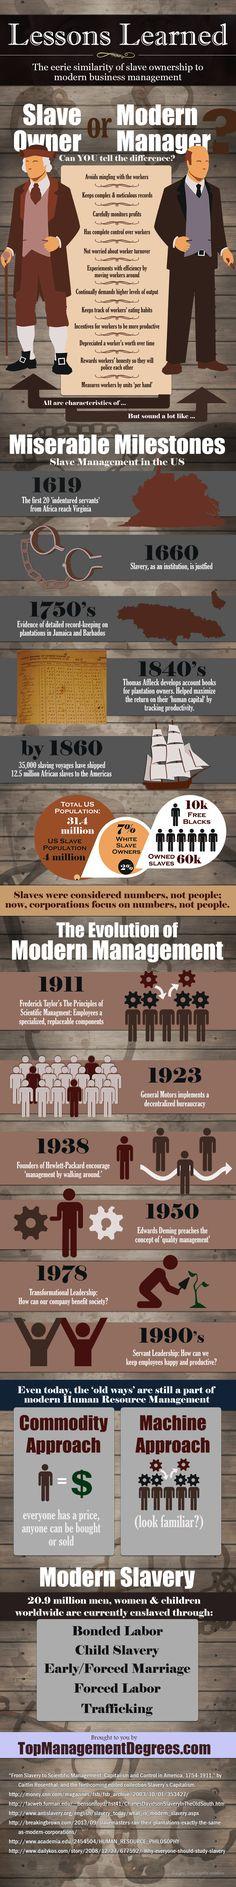 Las misteriosas similitudes entre la esclavitud y la gestión moderna #infografia #infographic#rrhh